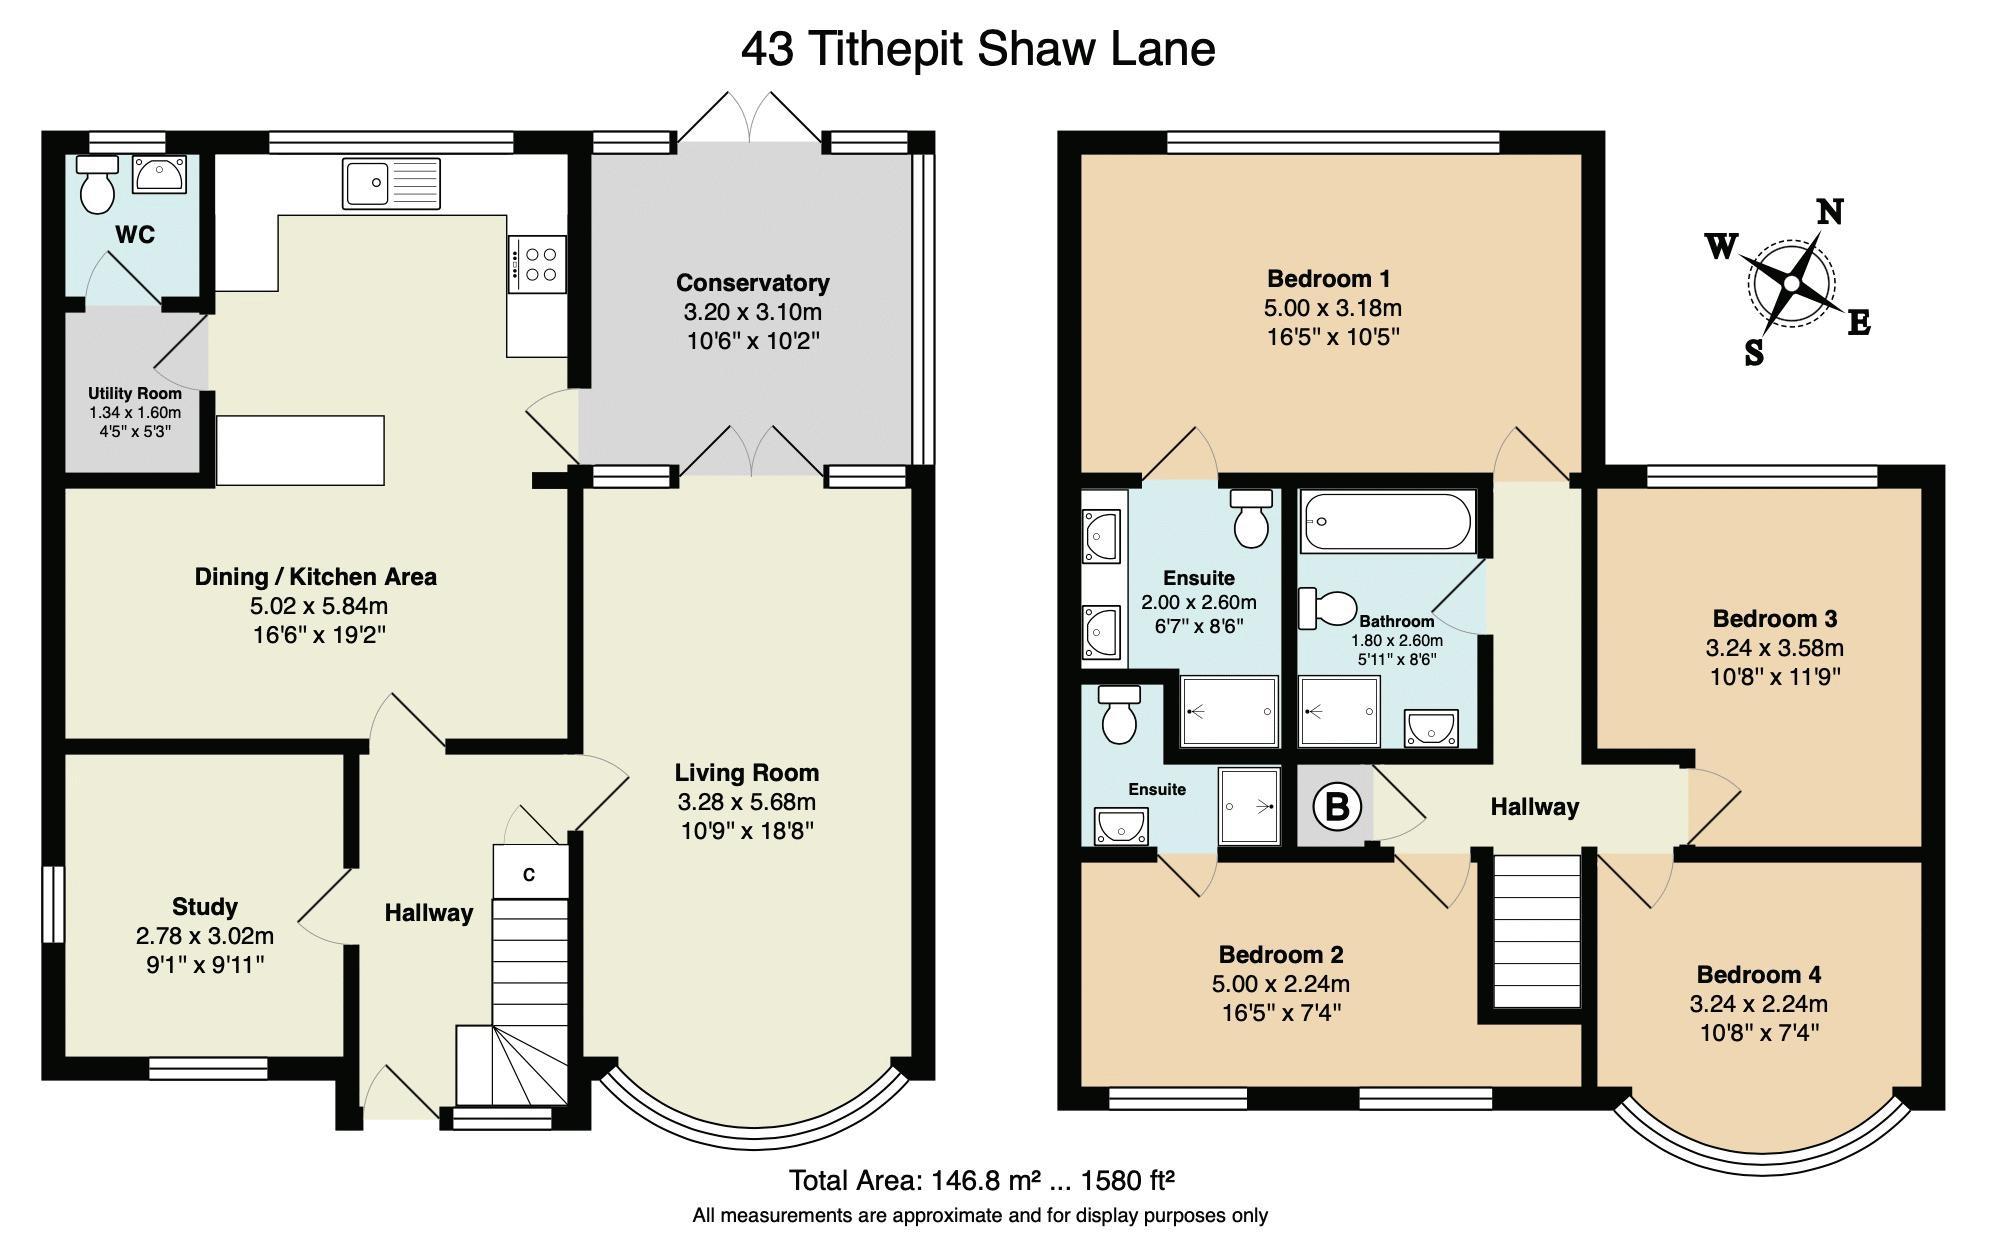 Tithepit Shaw Lane